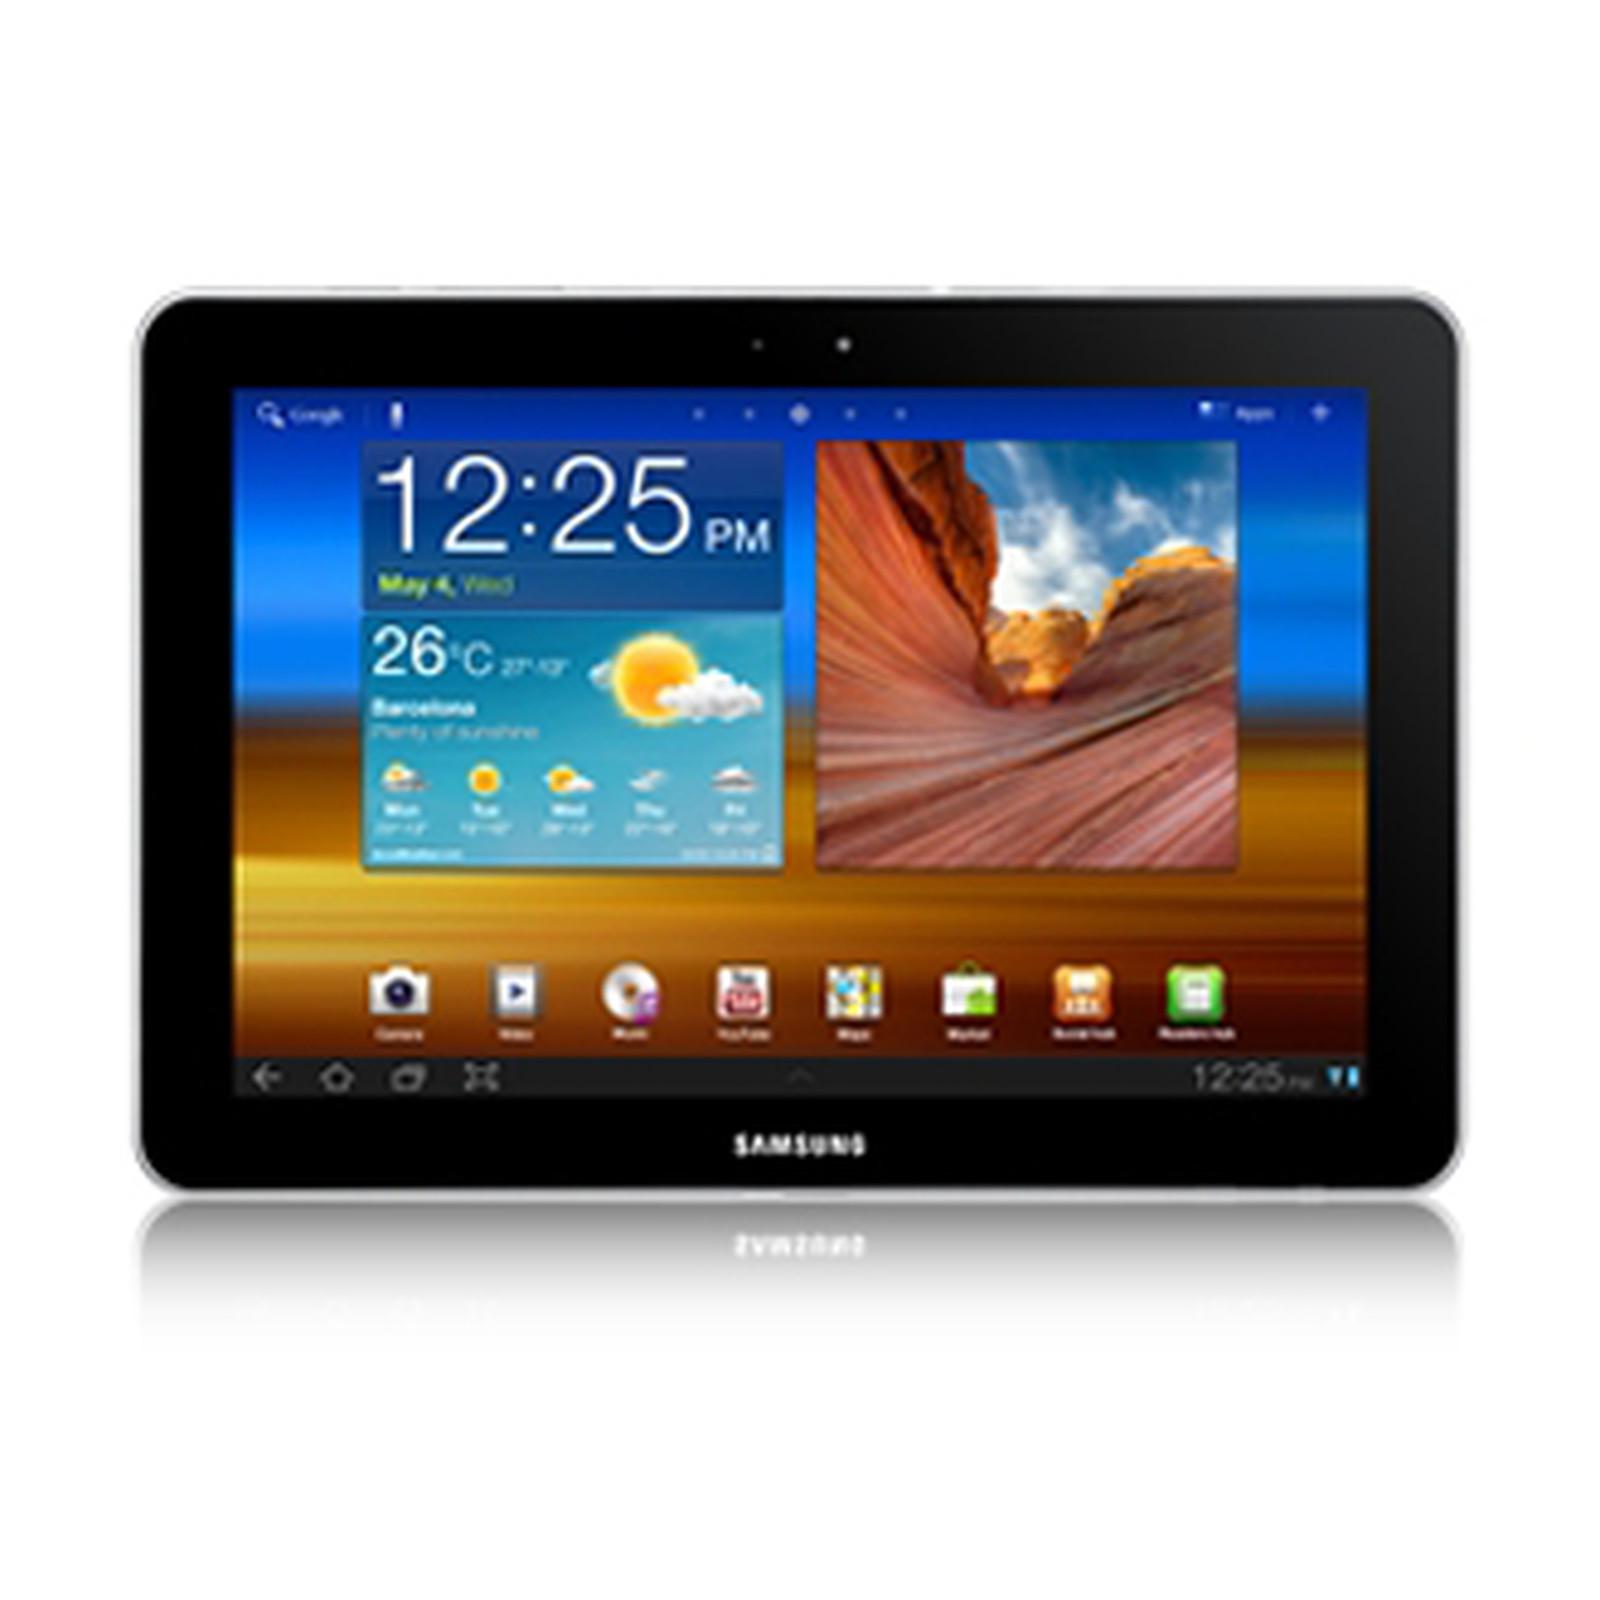 samsung galaxy tab 10 1 gt p7500 16 go tablette tactile. Black Bedroom Furniture Sets. Home Design Ideas